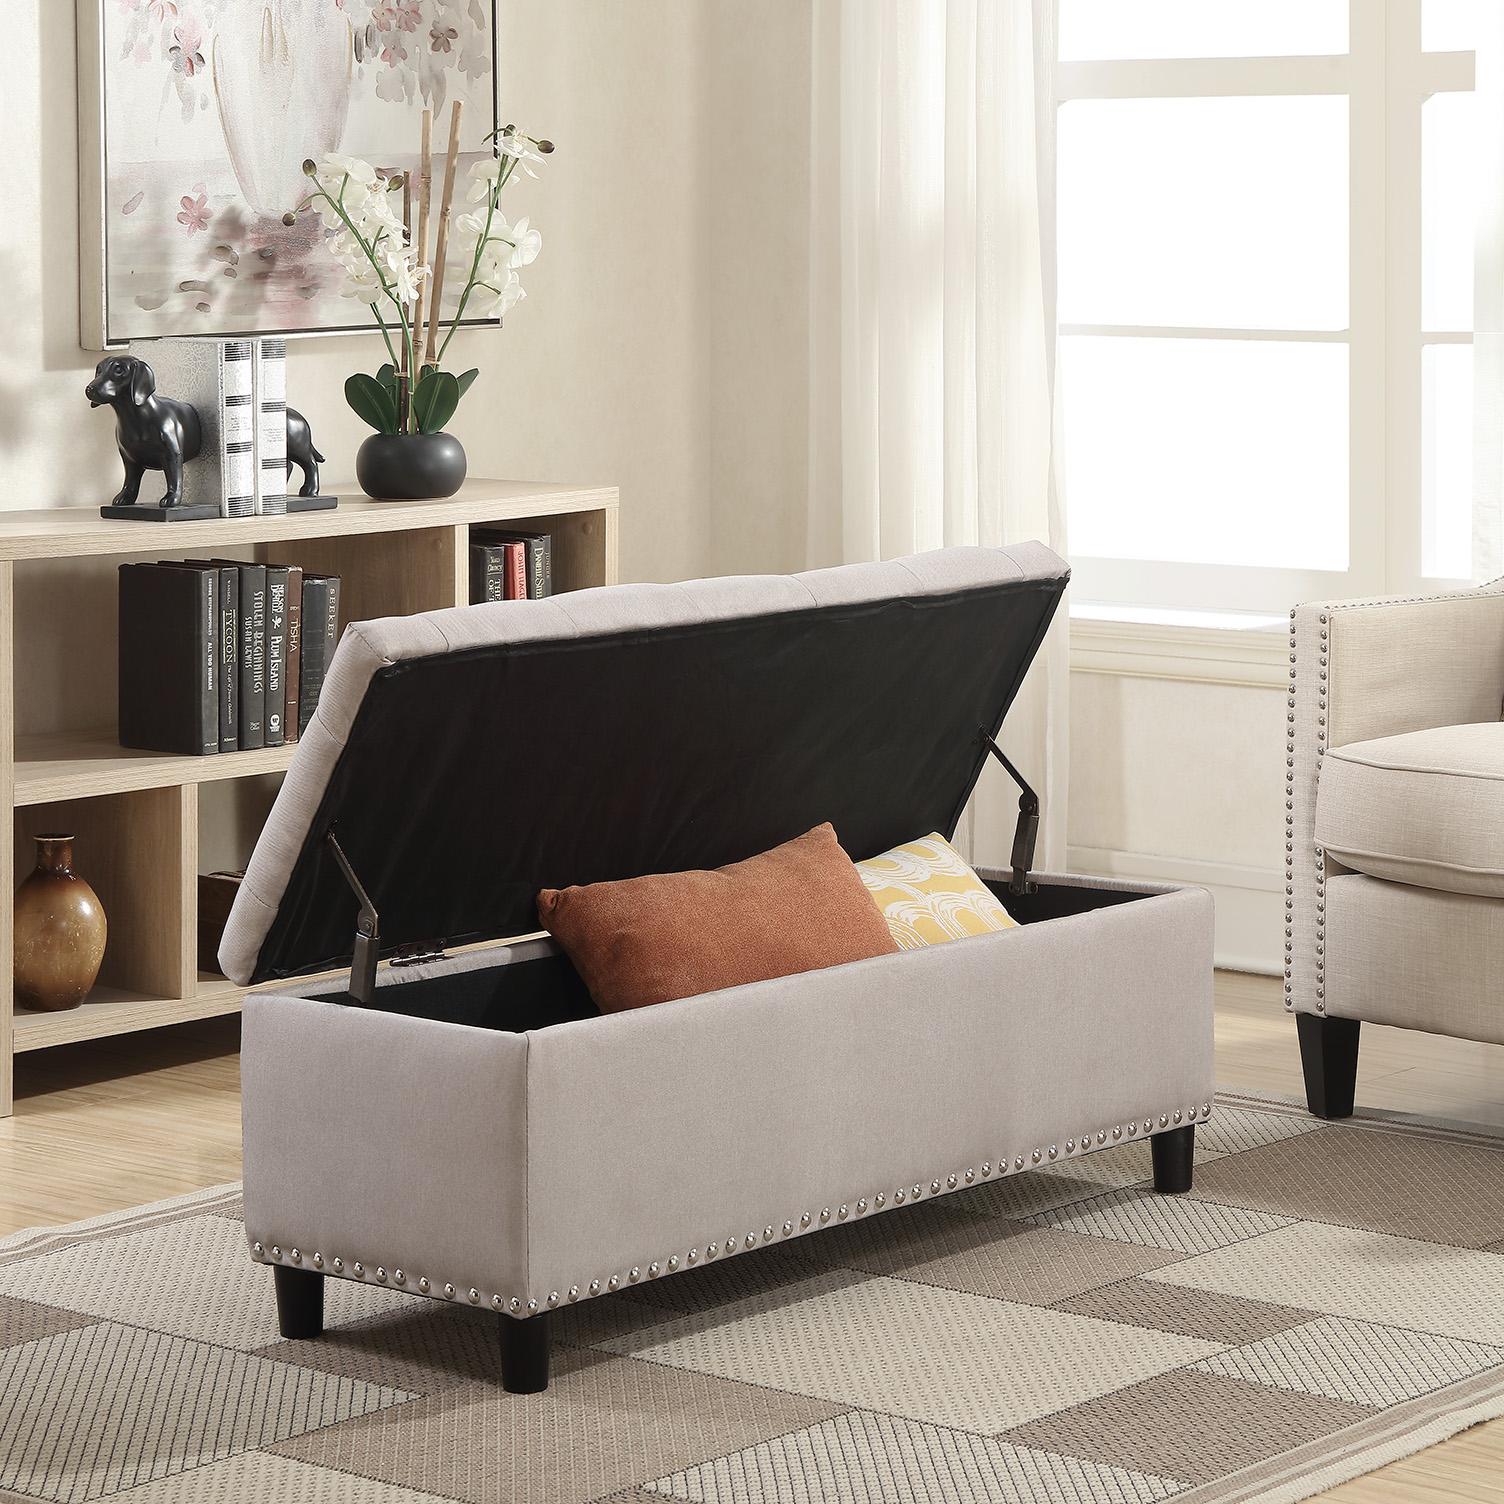 48-034-Faux-Leather-Linen-Storage-Ottoman-Footrest-Bench-Lift-Top thumbnail 16